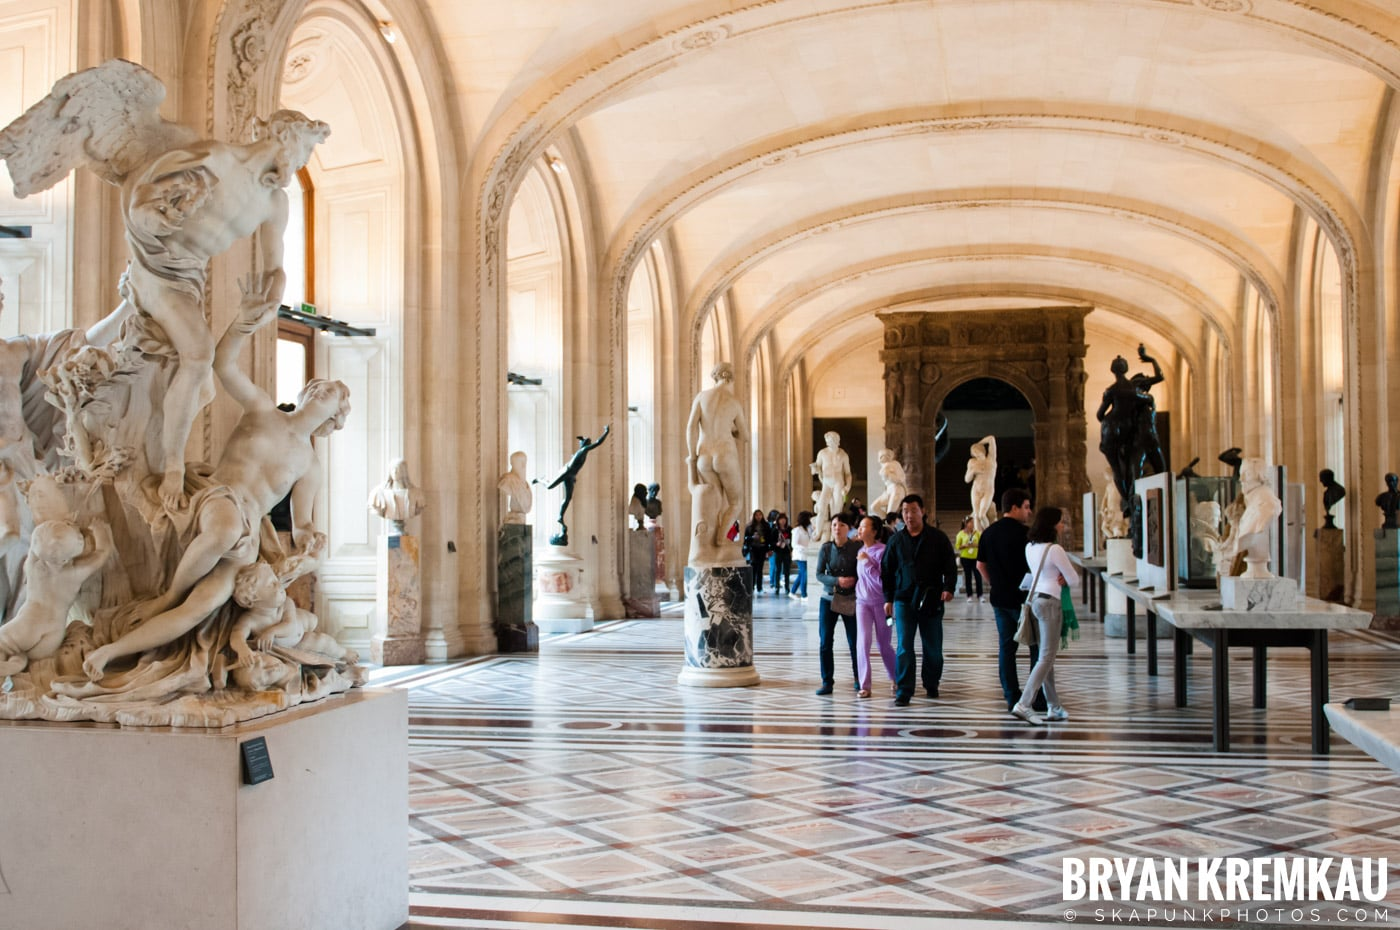 Paris, France Honeymoon - Day 3 - 7.20.11 (91)